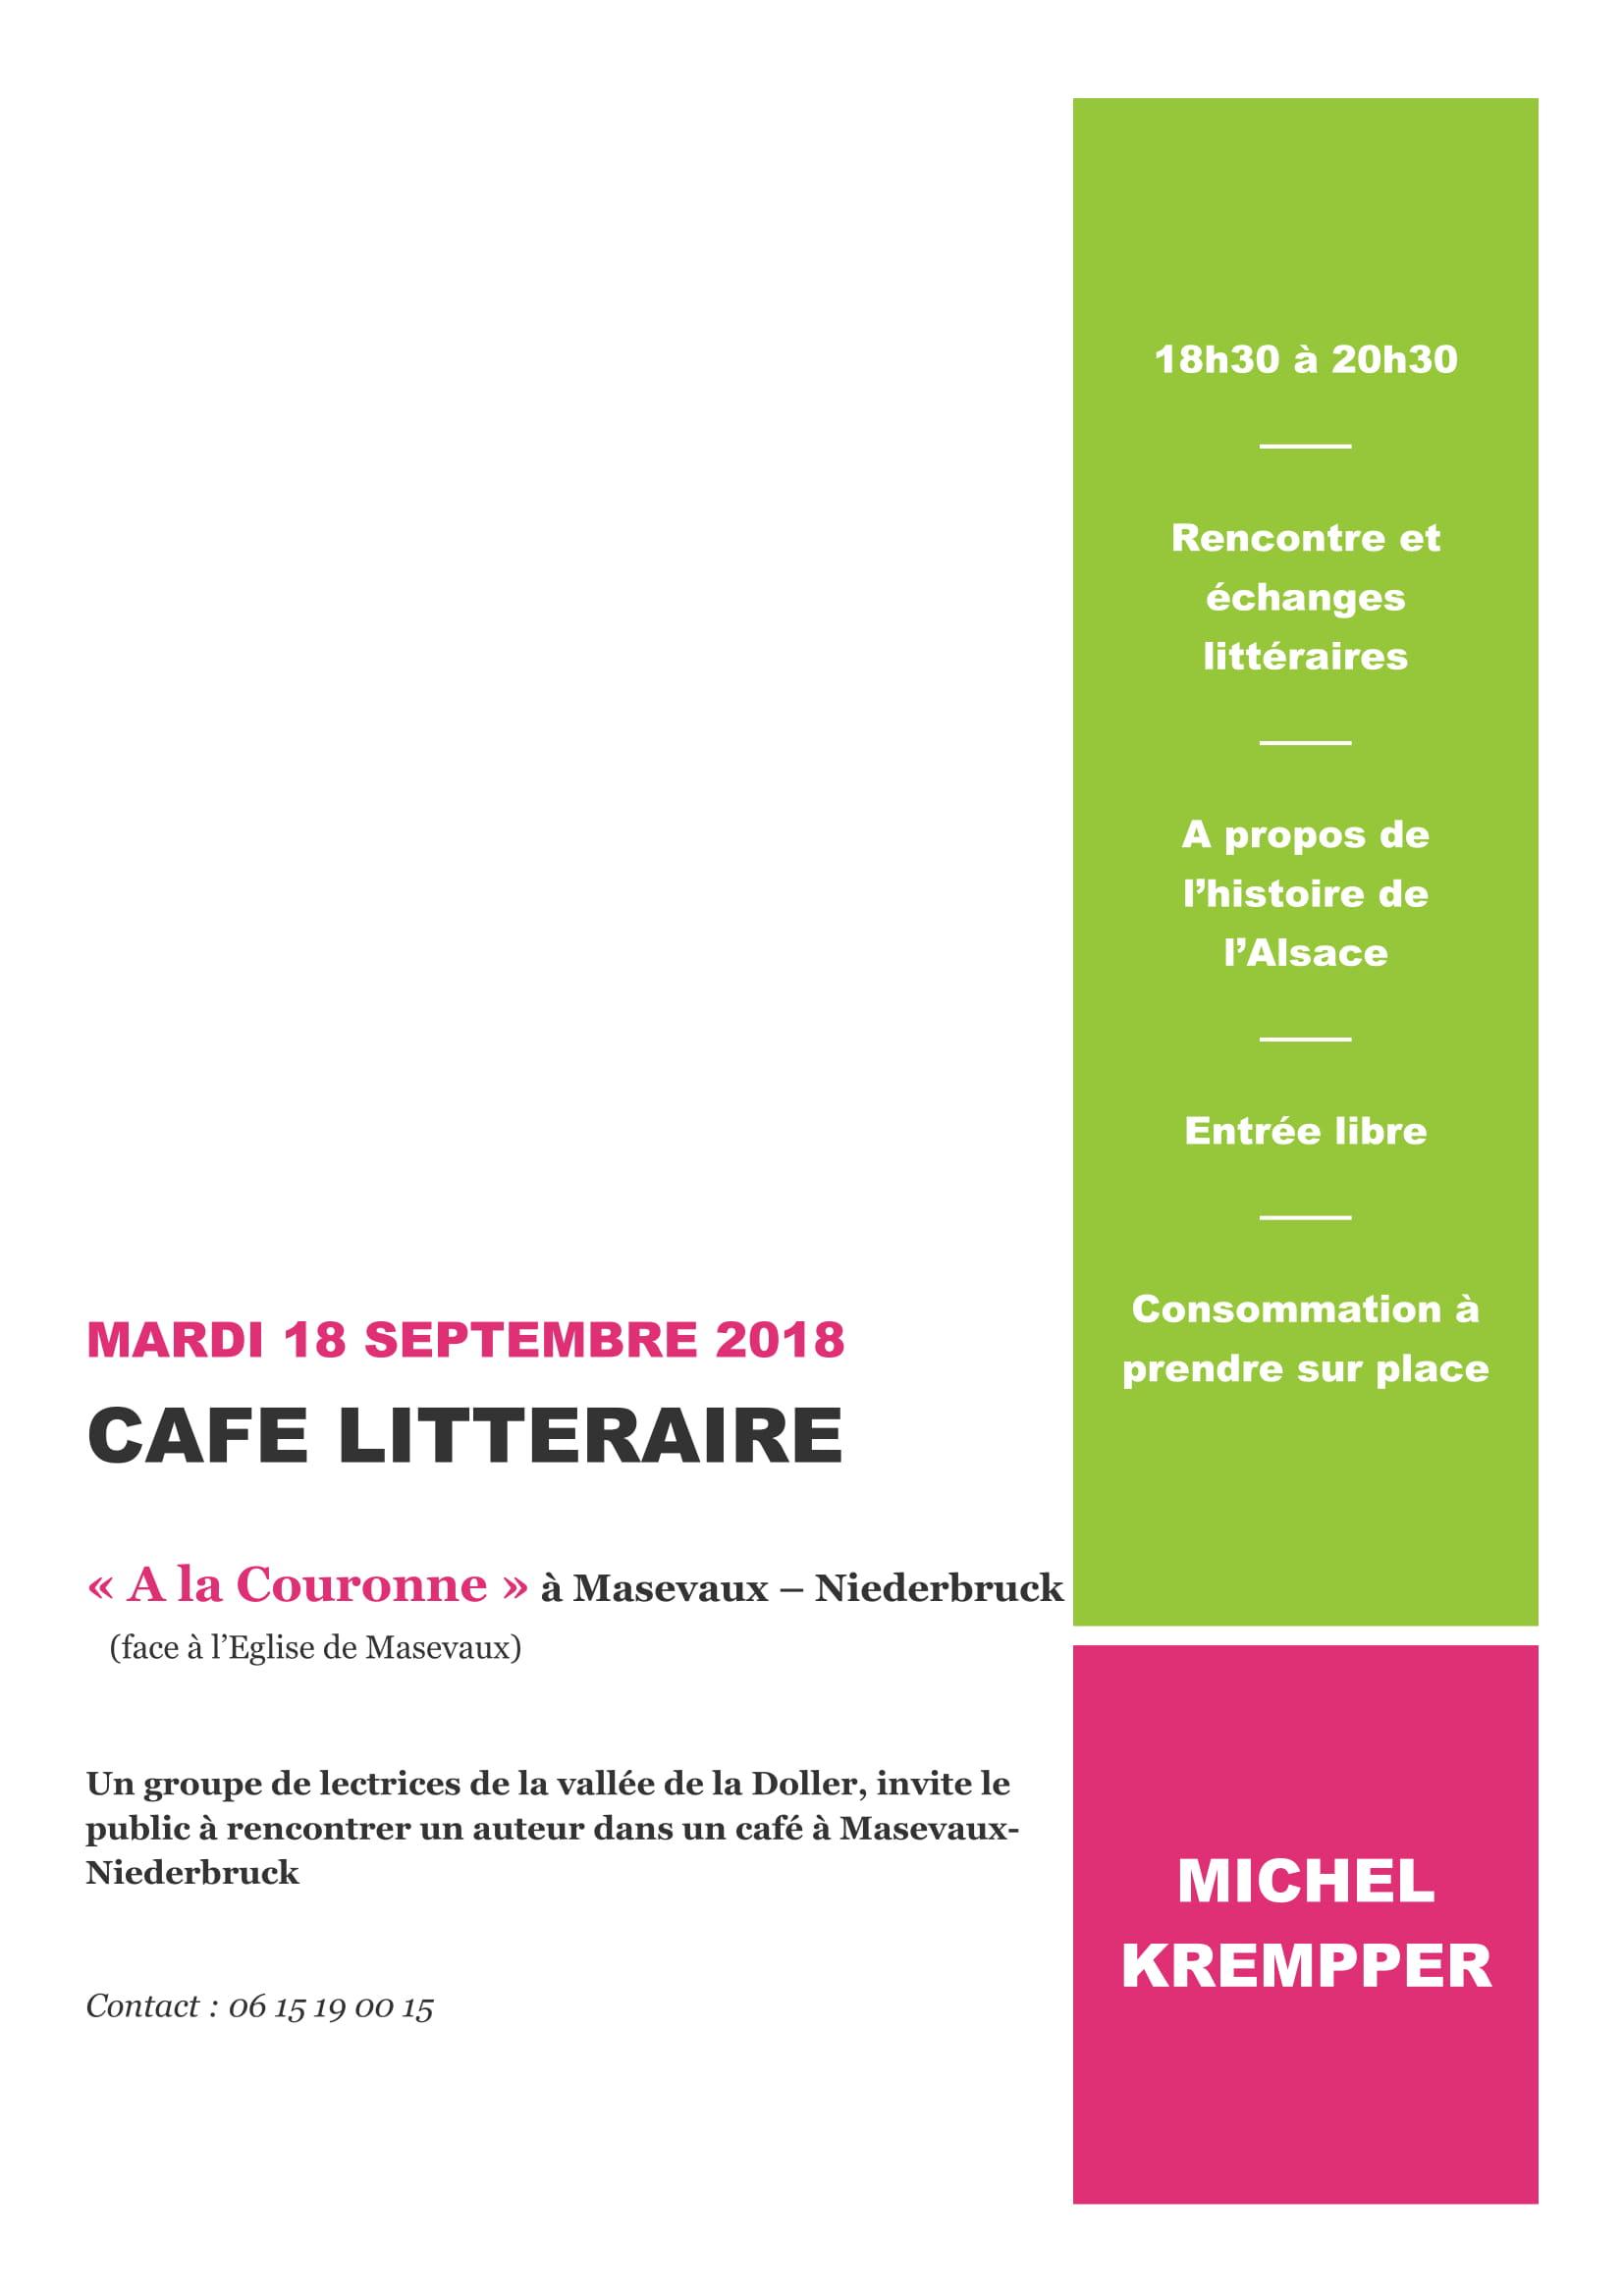 Flyer d'invitation Michel Krempper 18 sept 2018 (1)-1